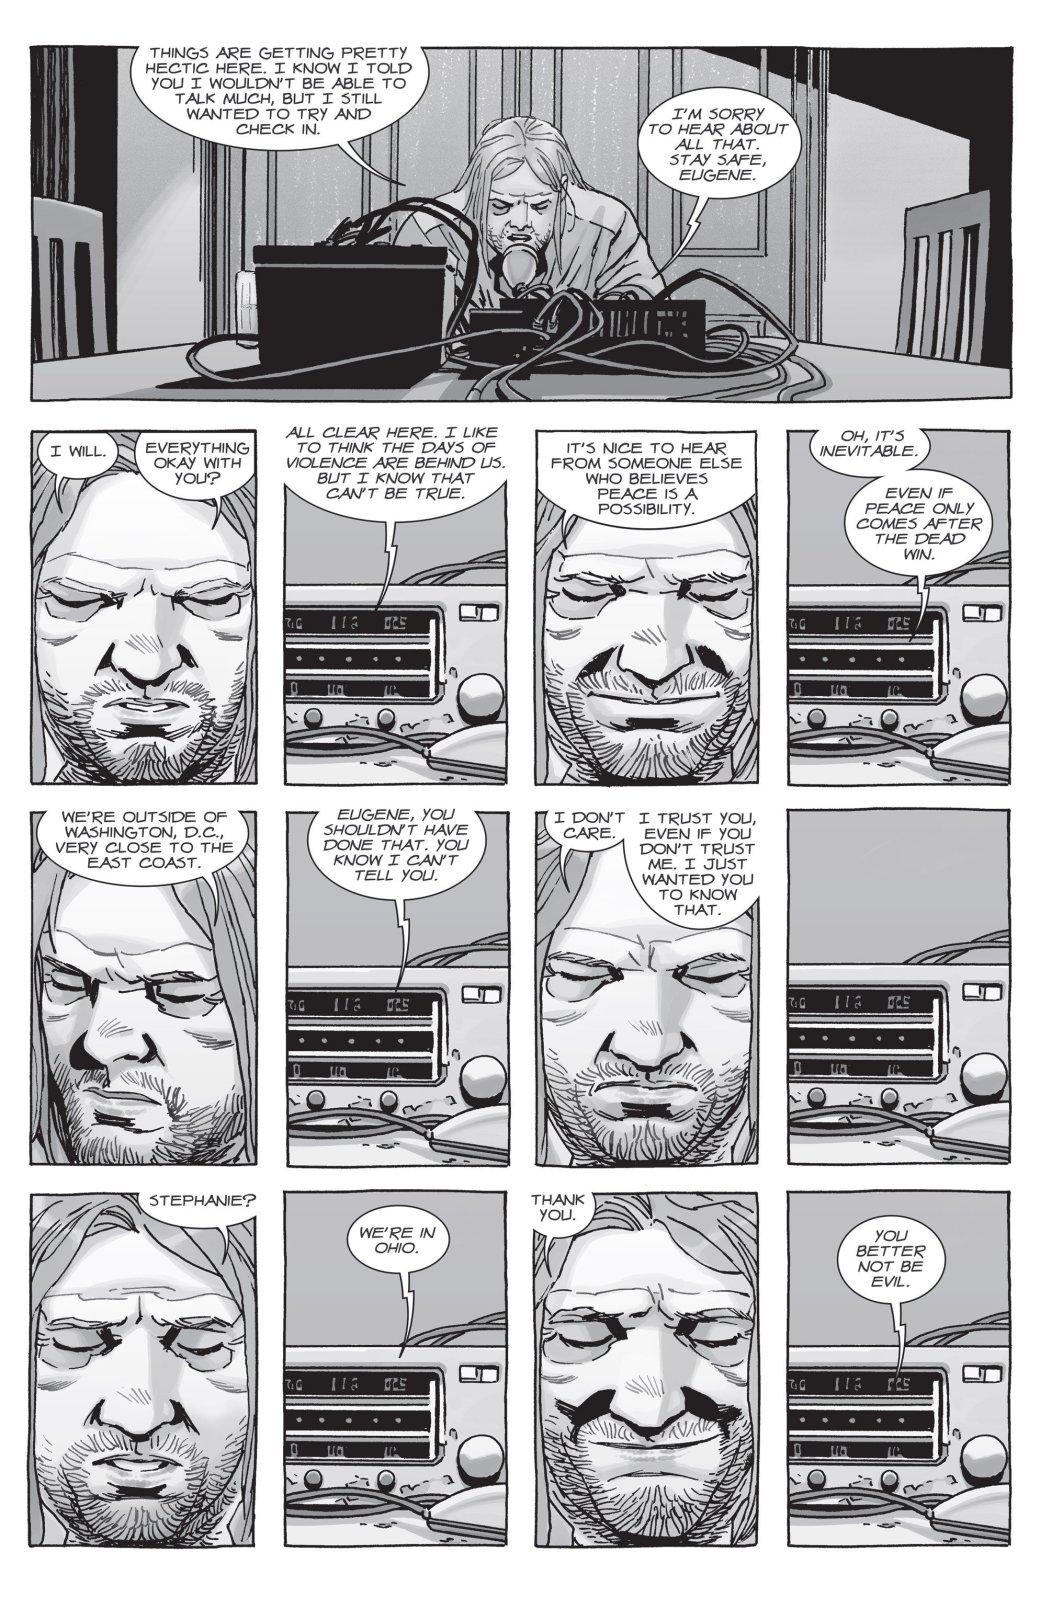 Война с Шепчущимися в комиксе The Walking Dead не оправдала ожиданий | Канобу - Изображение 7